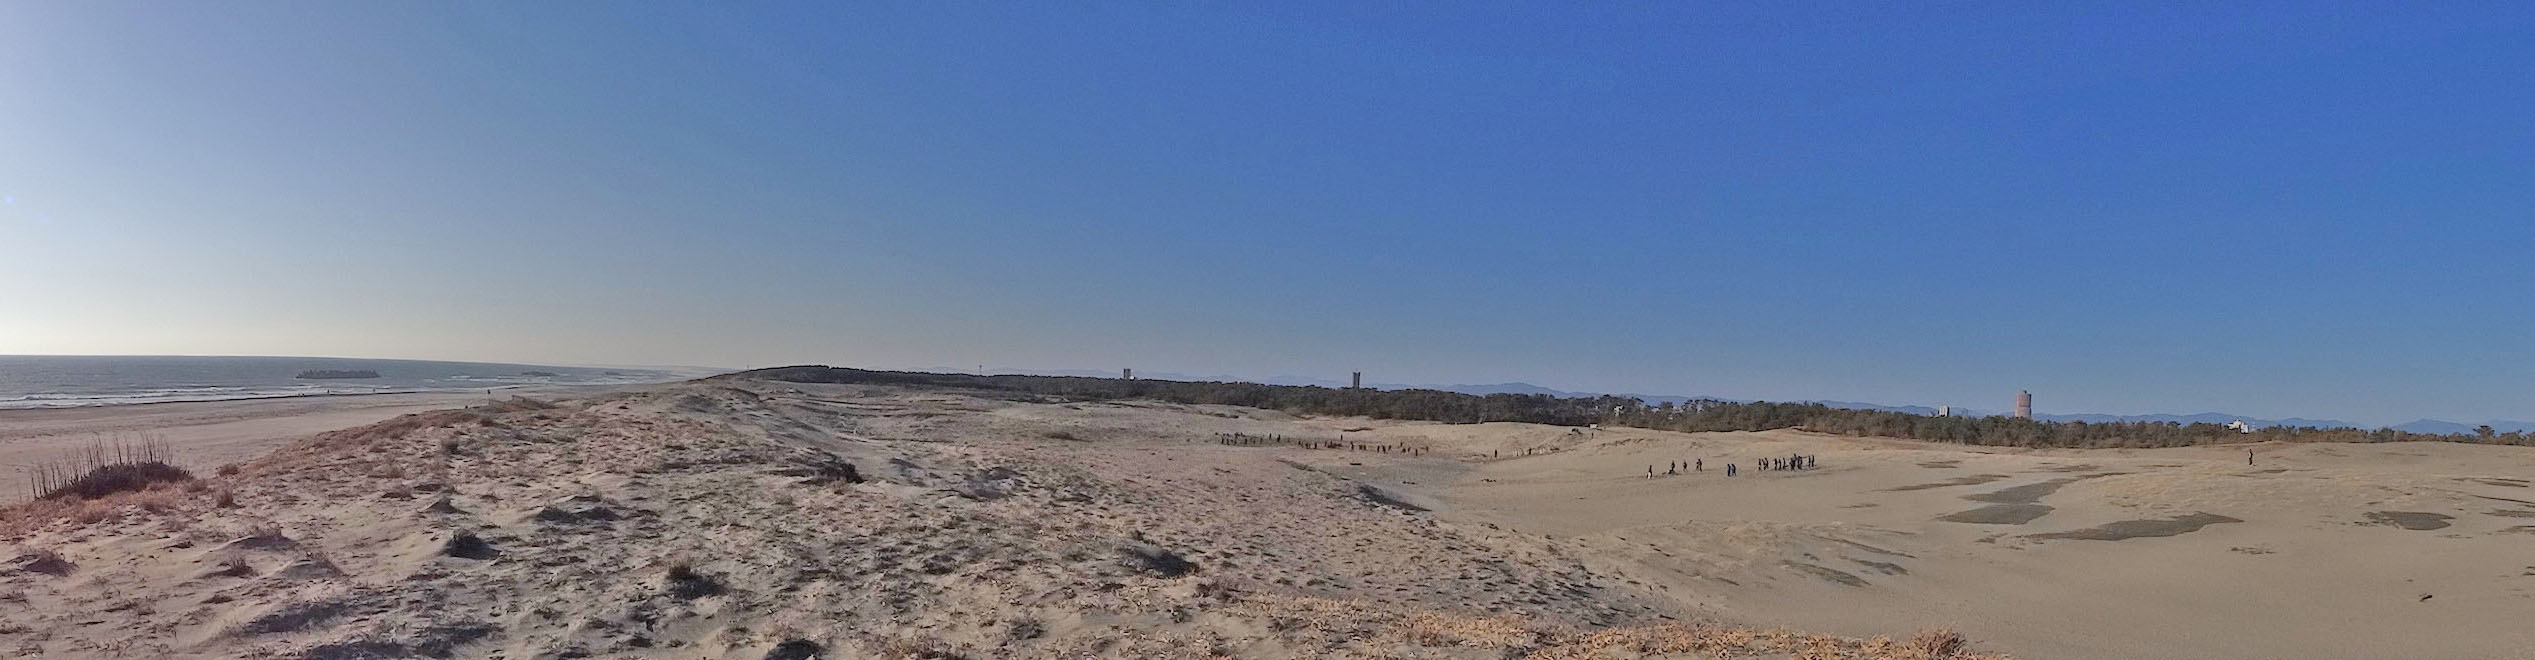 Three major sand dunes in Japan